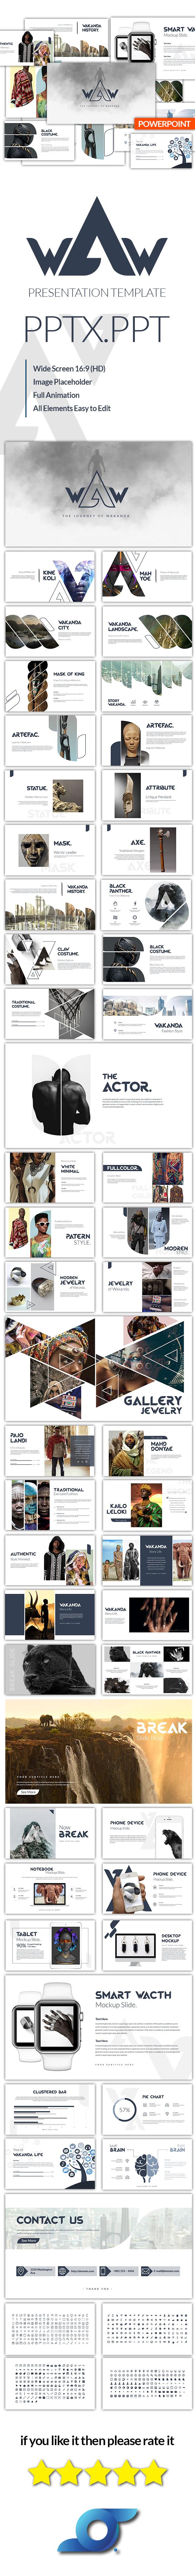 Wakanda Creative Template - Creative PowerPoint Templates